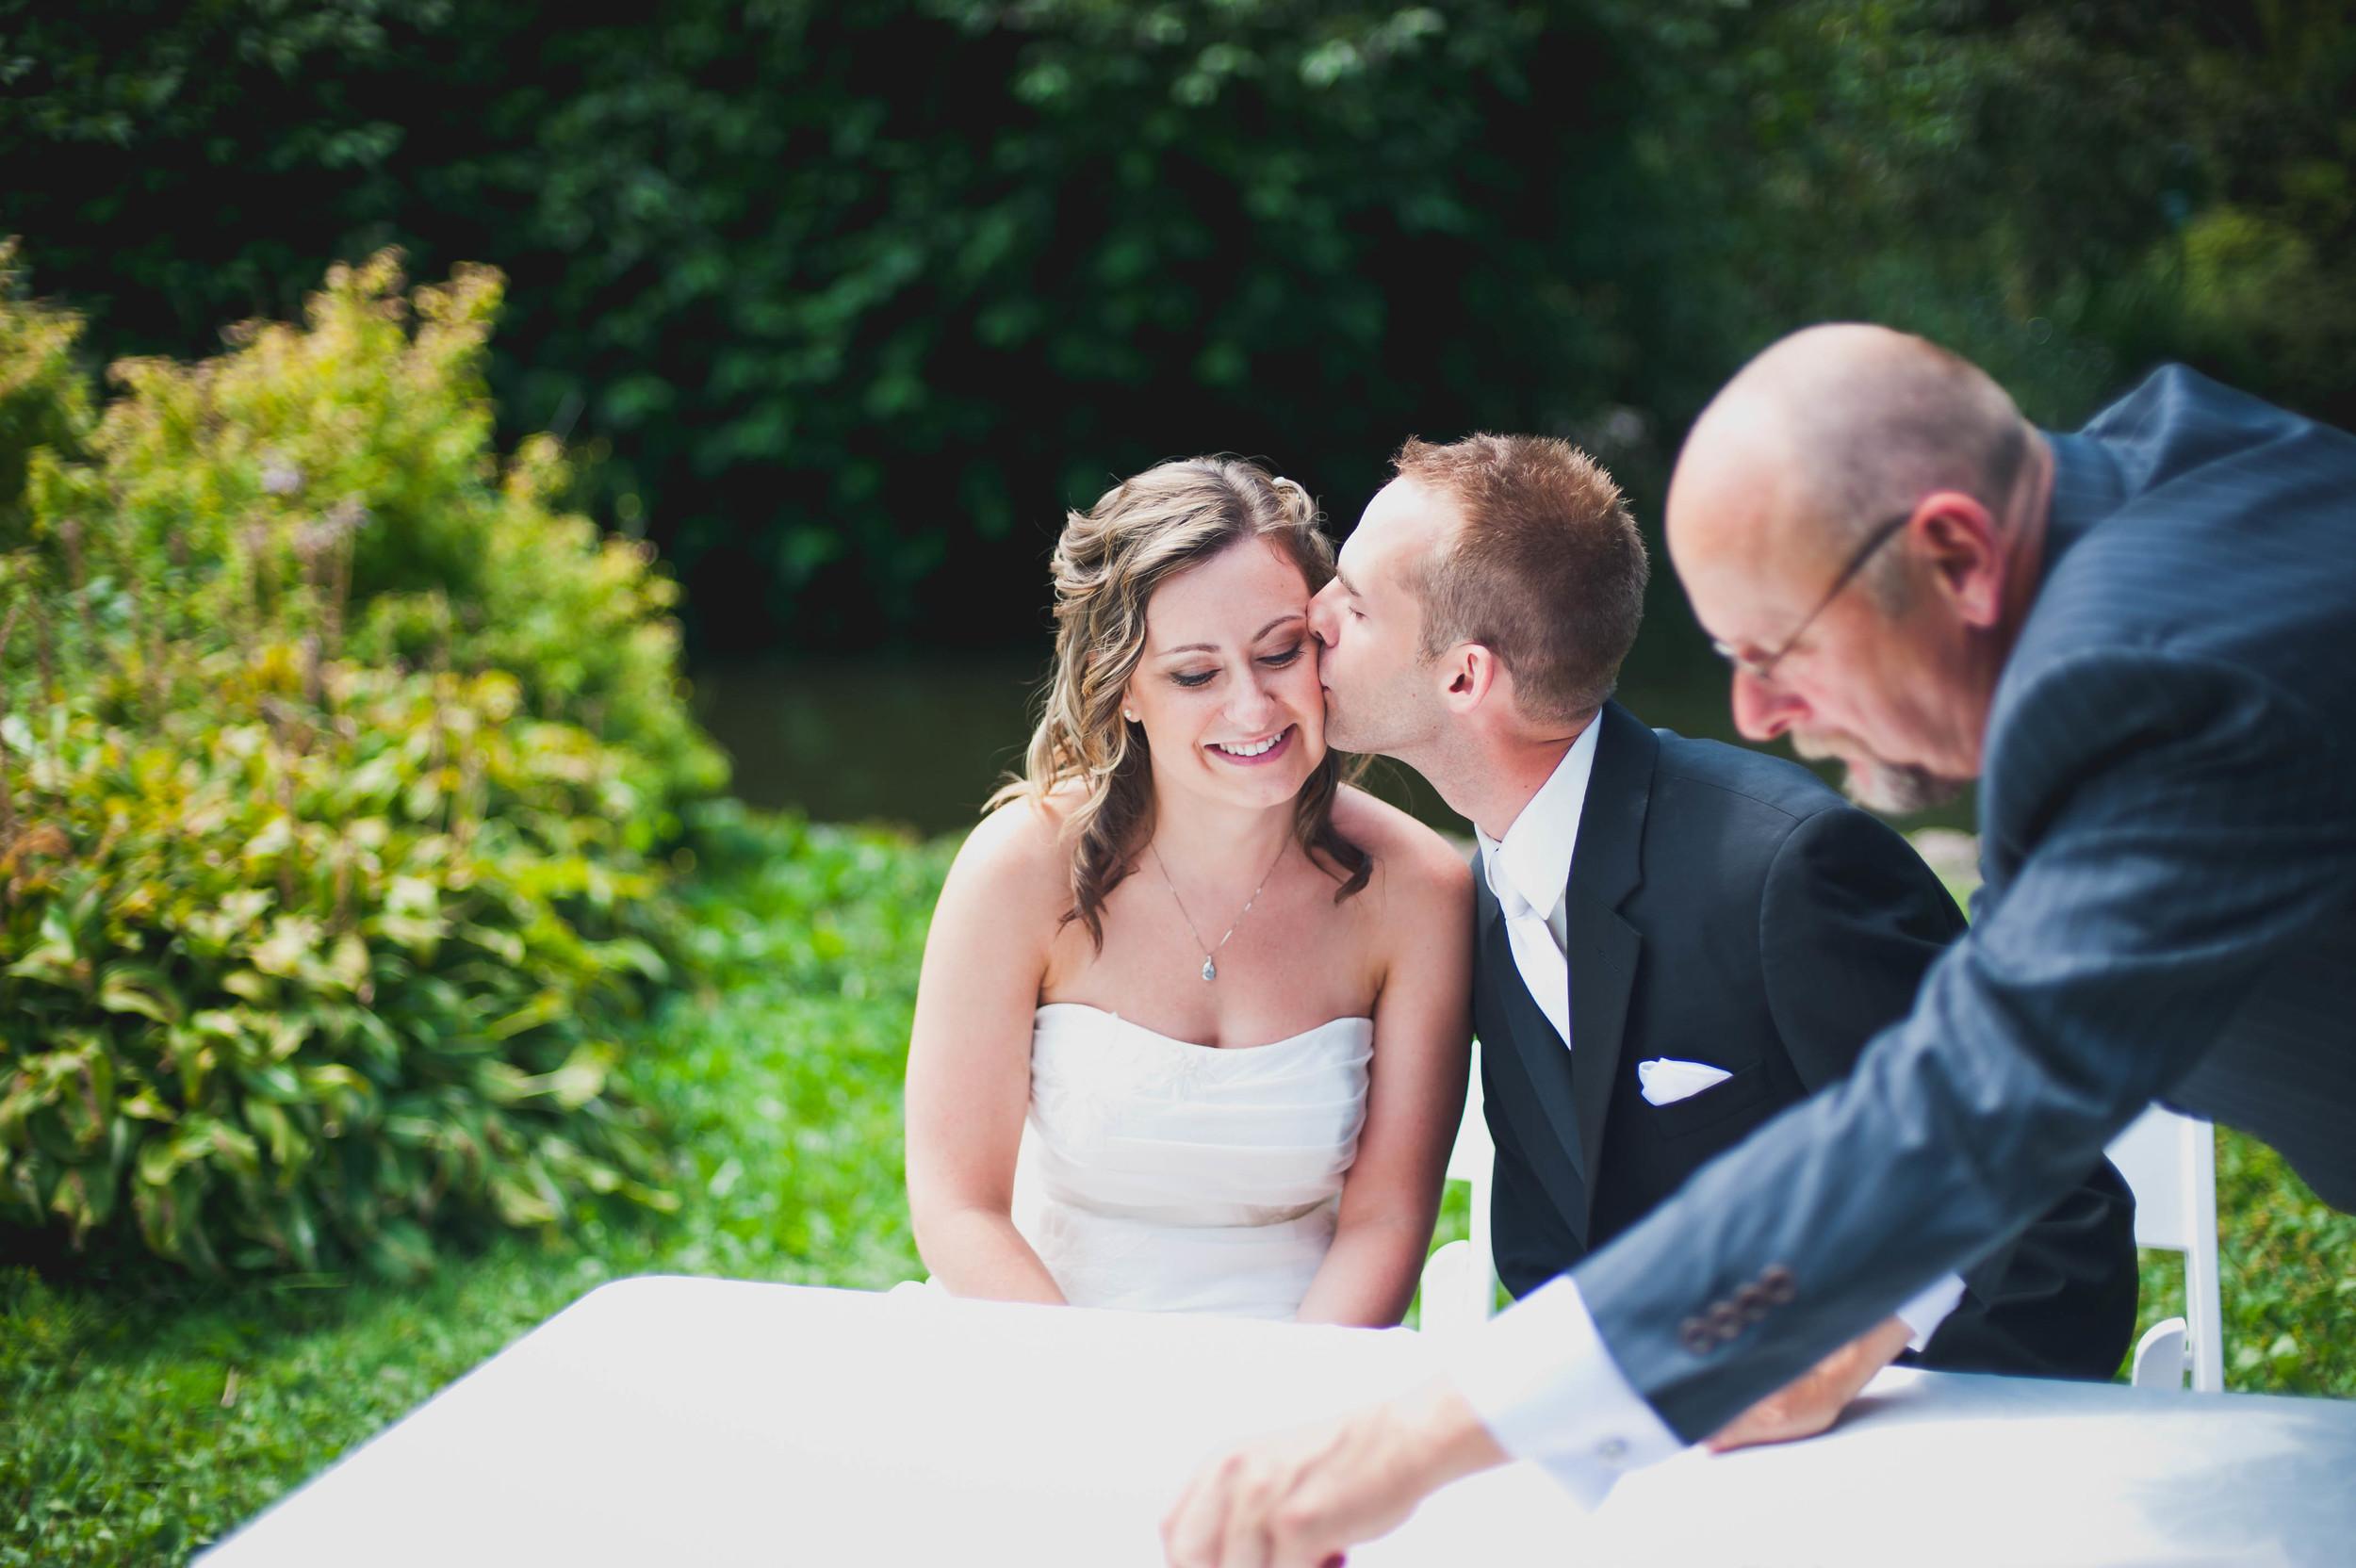 Victoria Beacon Hill park wedding photography edward lai photogrpaher